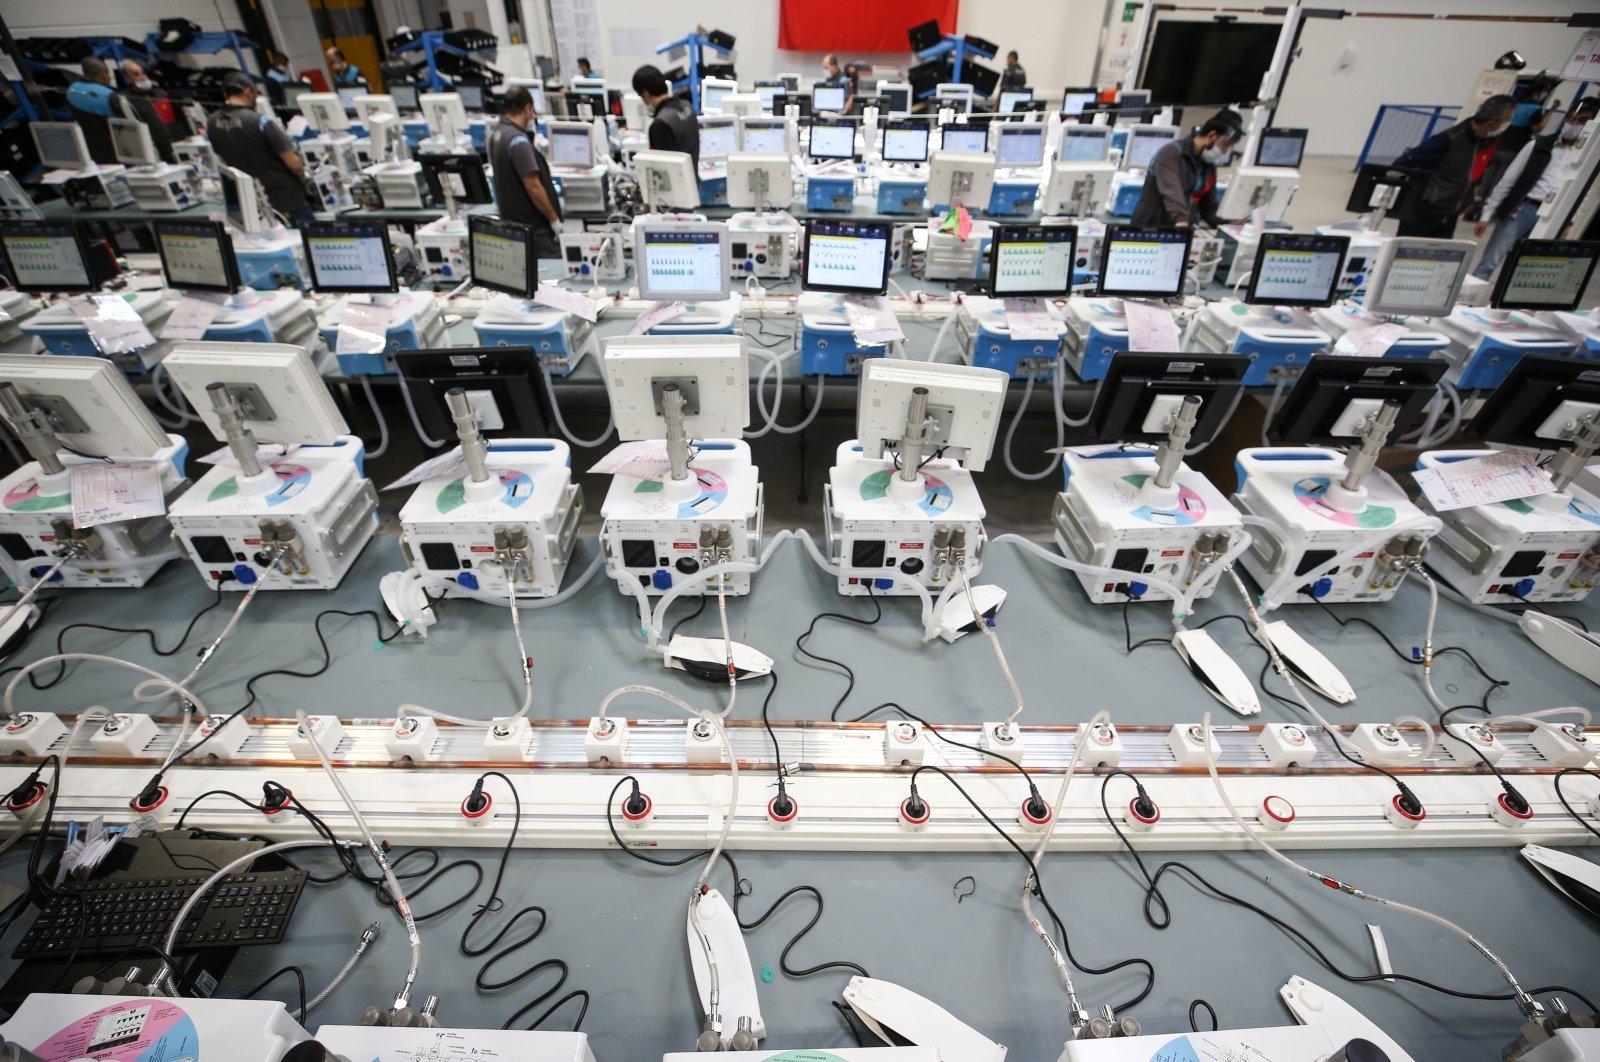 Turkish ventilators in production at an Arçelik factory in Çerkezköy district, Tekirdağ province, Turkey, April 12, 2020. (AA Photo)